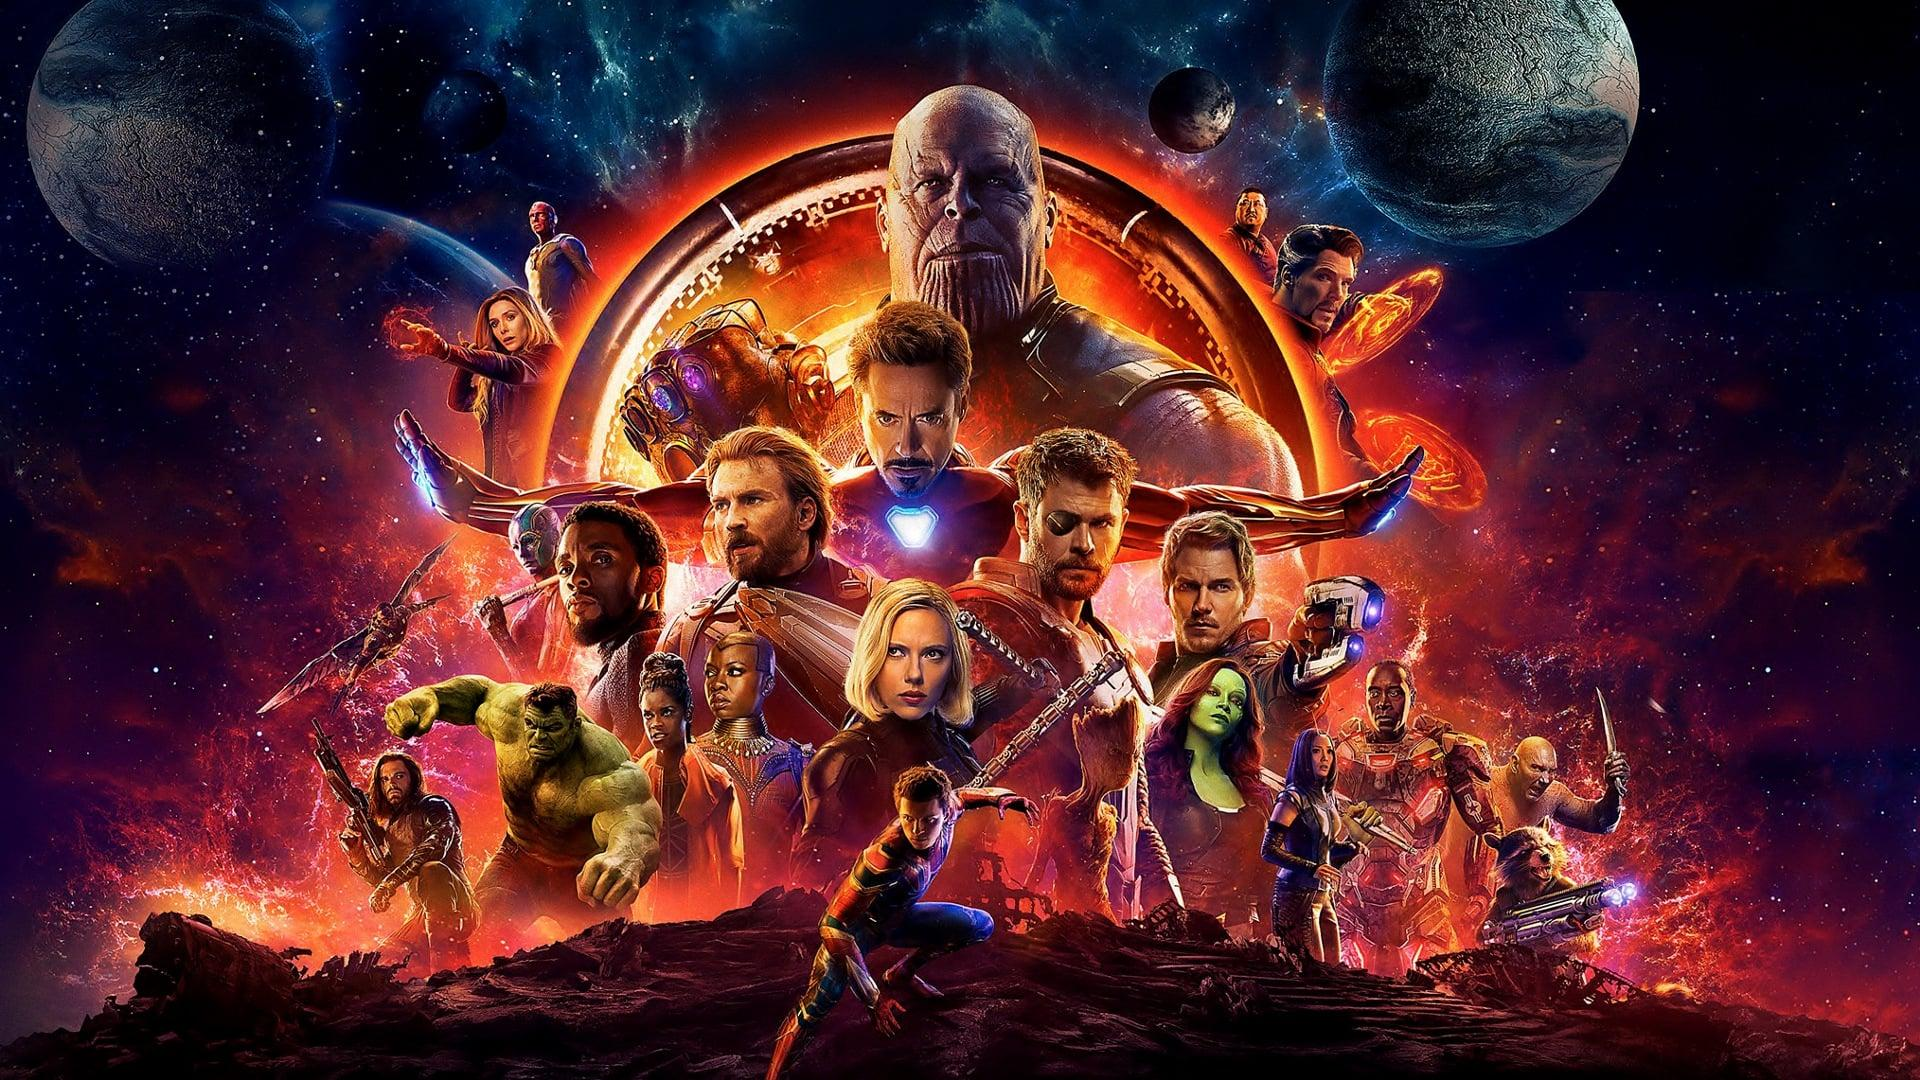 Avengers 3: Infinity War poster